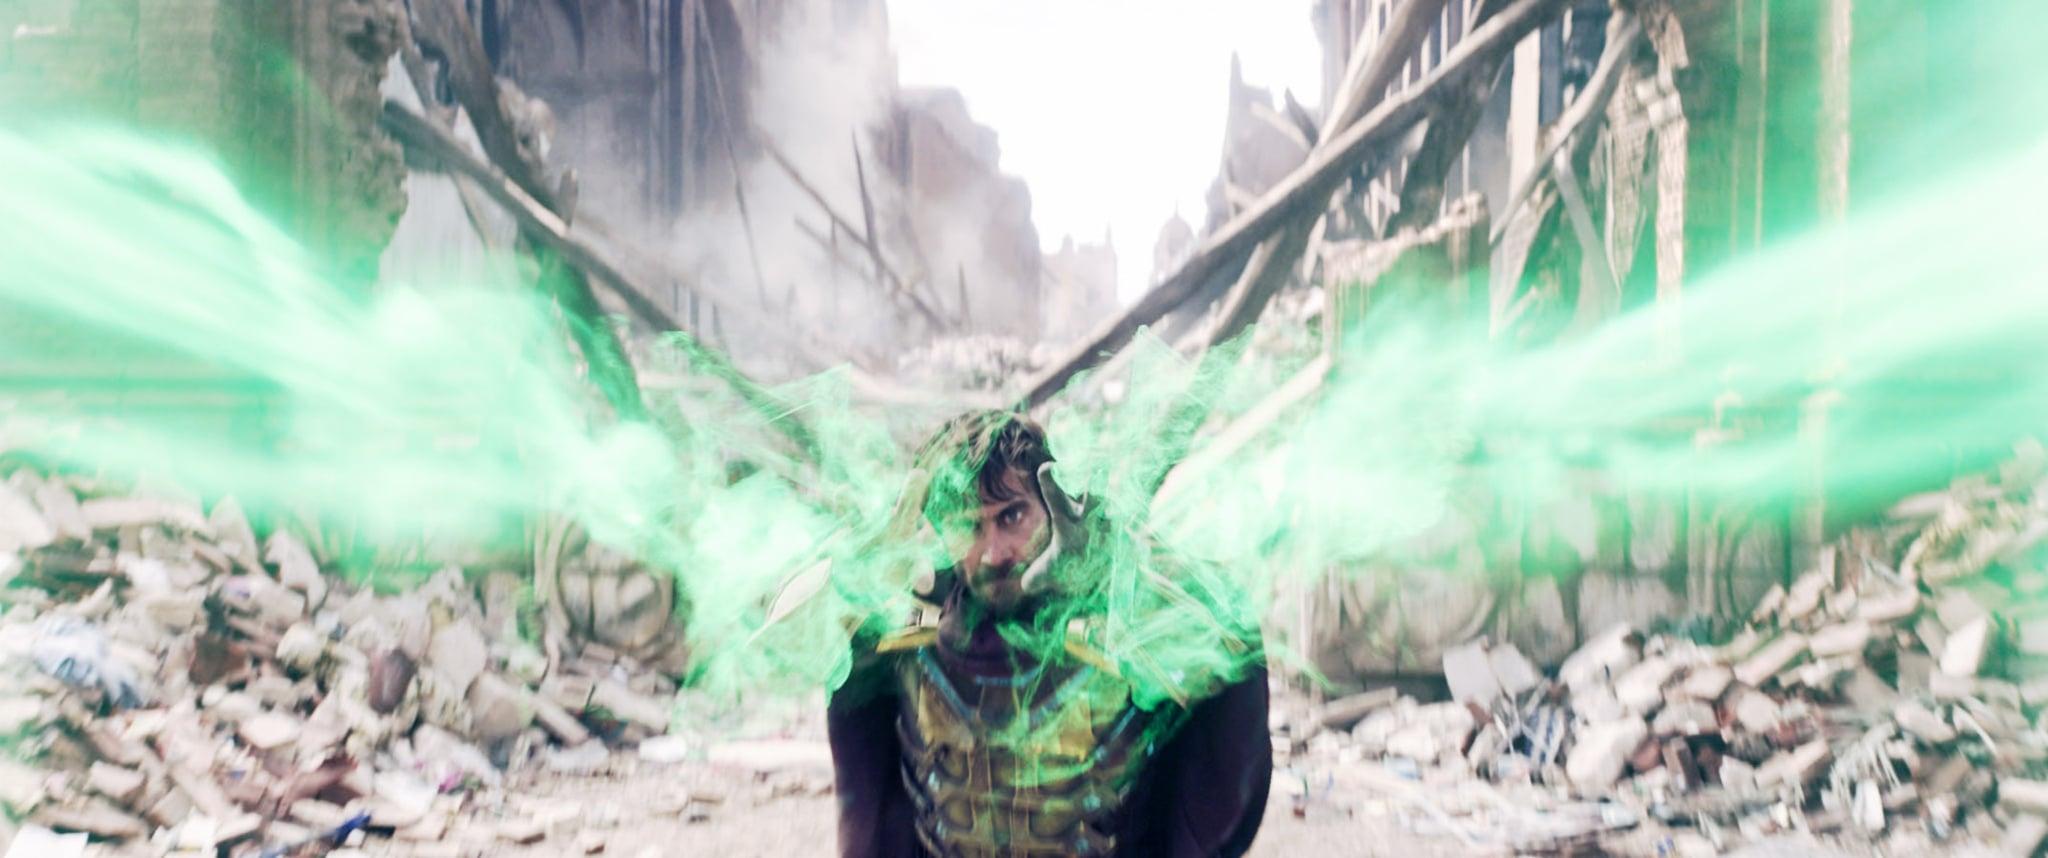 SPIDER-MAN: FAR FROM HOME, Jake Gyllenhaal, 2019.  Columbia /  Marvel Studios/ Courtesy Everett Collection